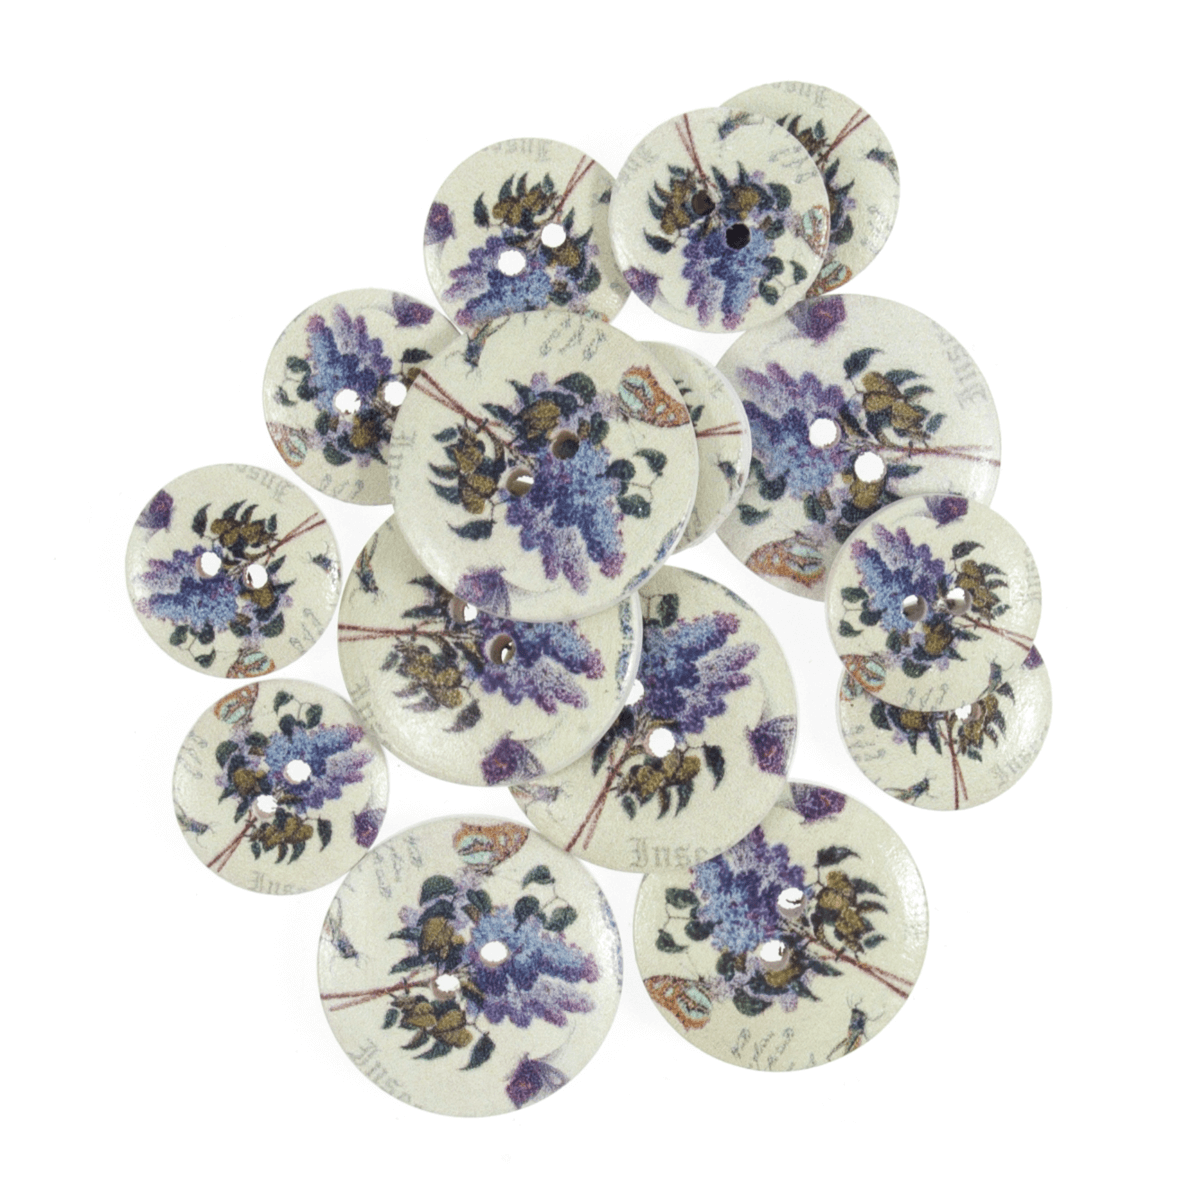 15 x Assorted Butterfly Tulip Flower Wooden Craft Buttons 18mm - 25mm